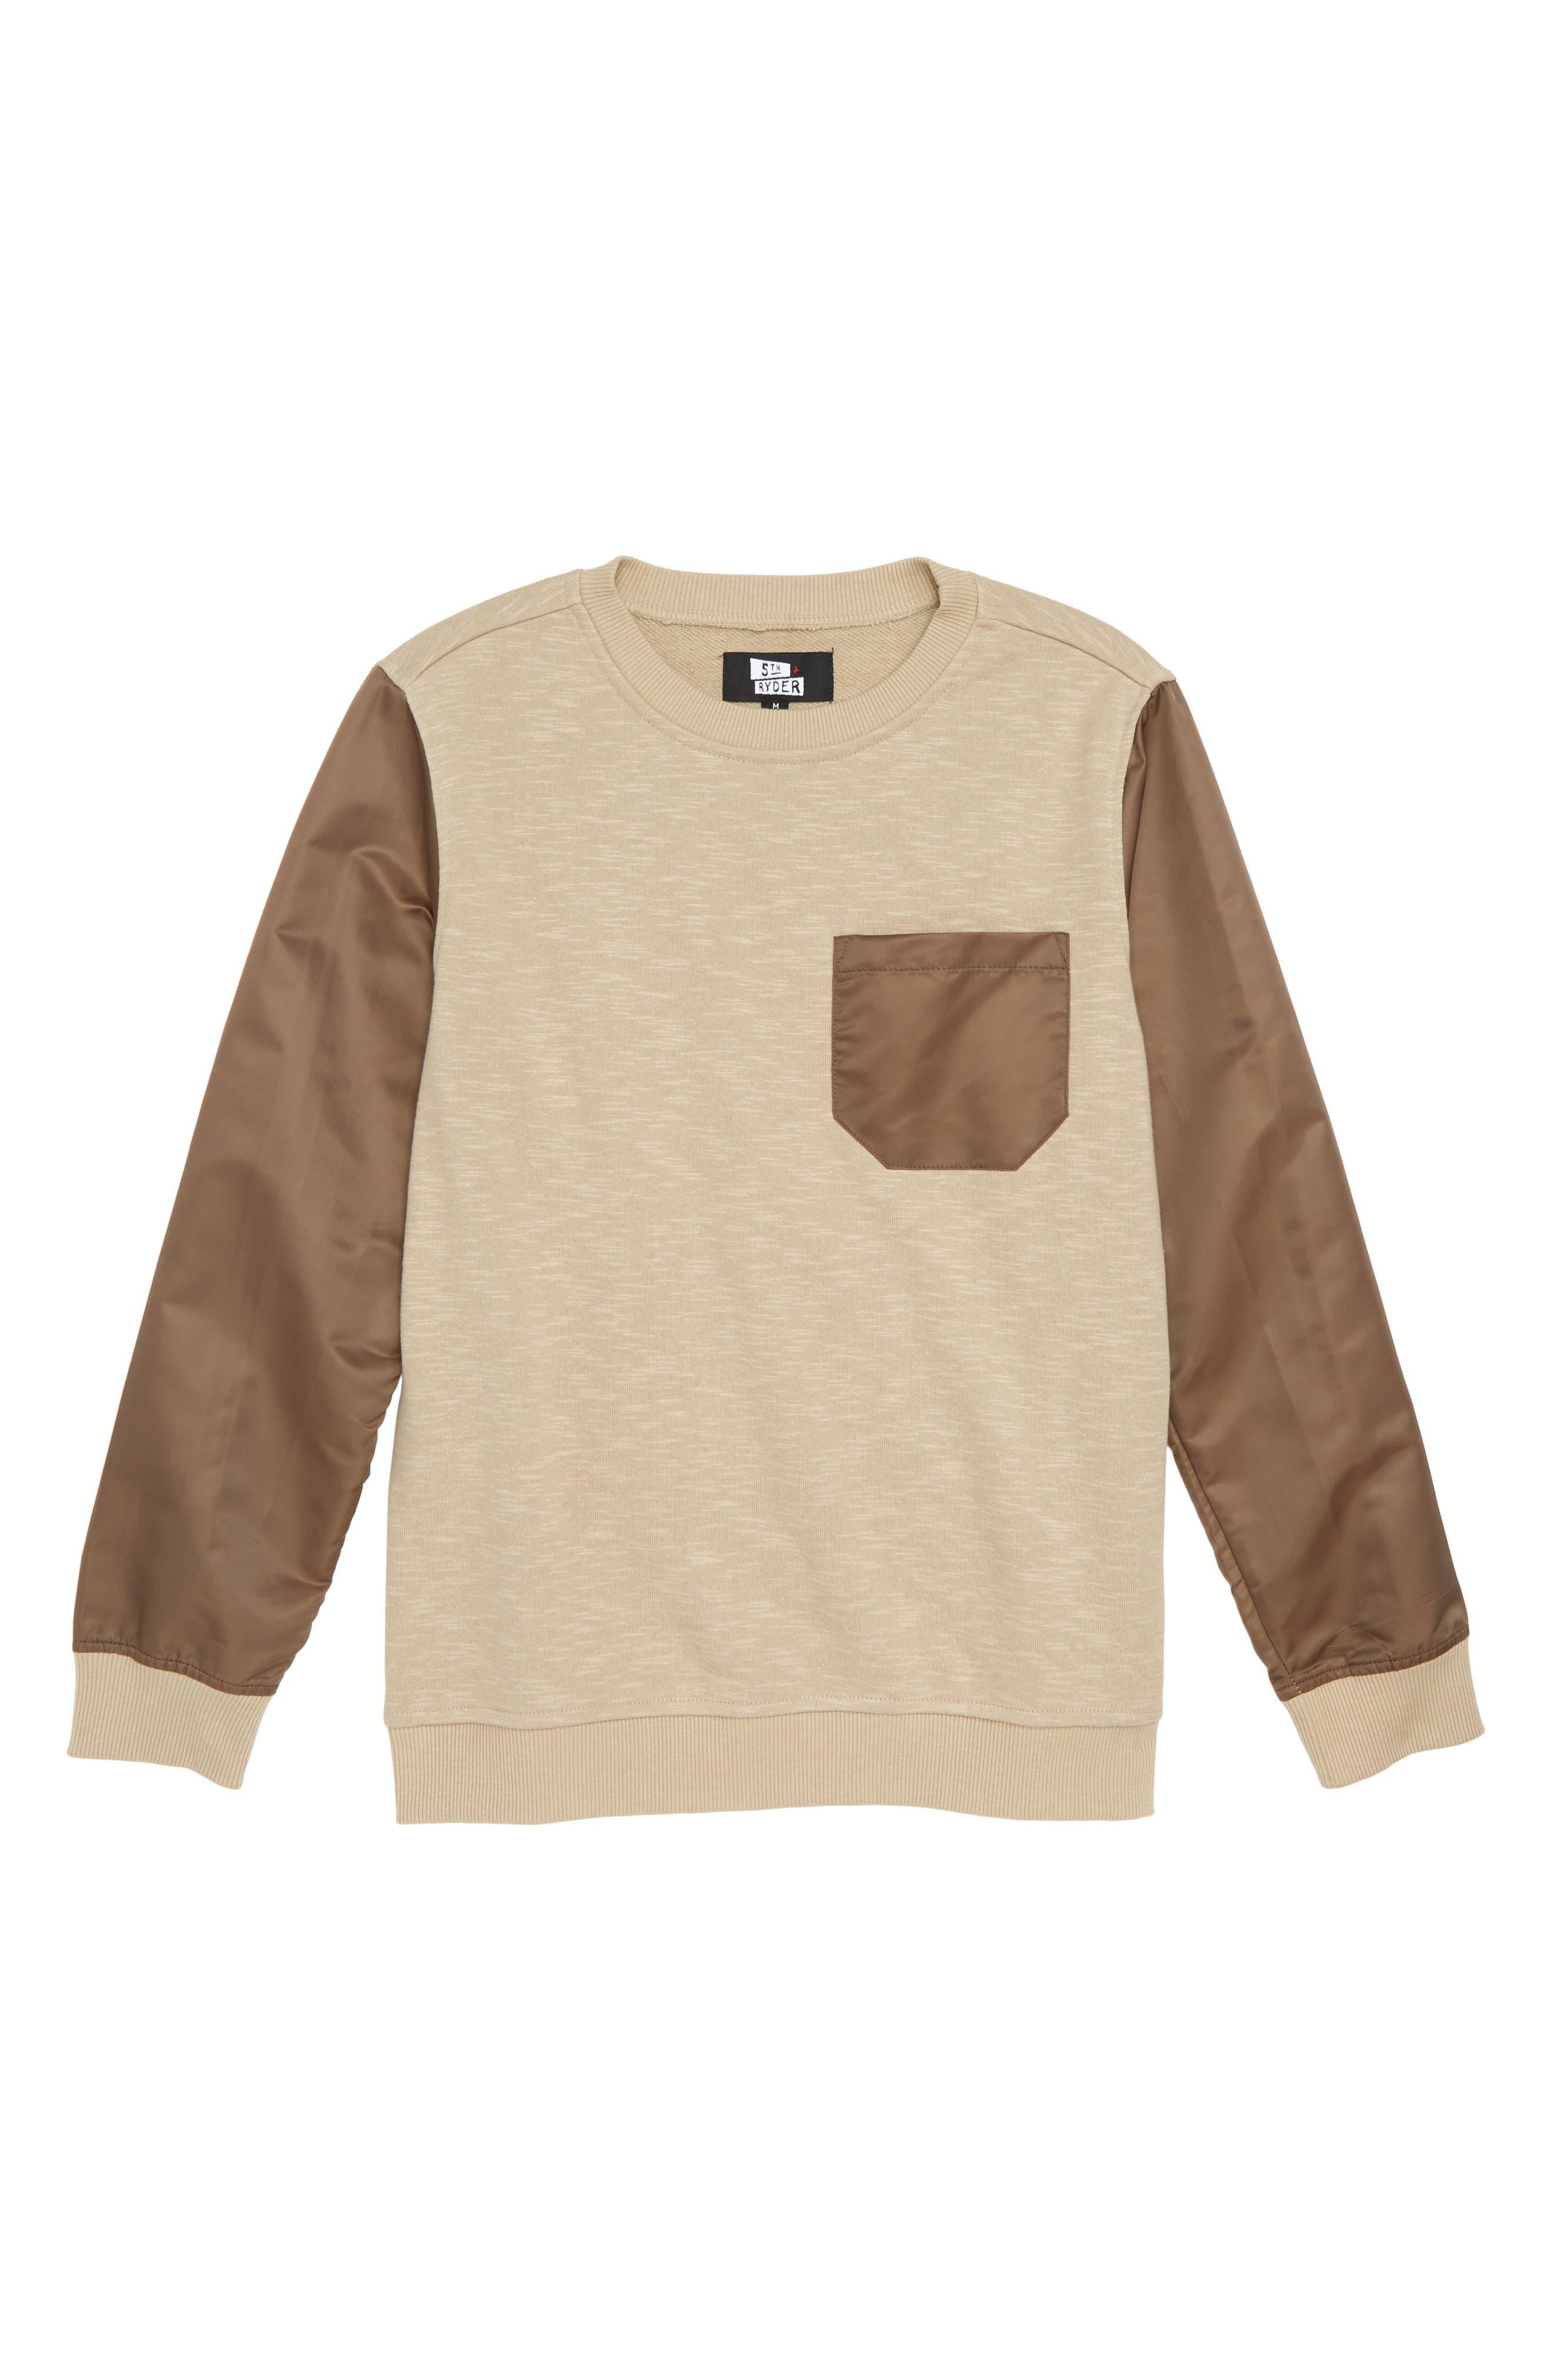 Elwood Pocket Sweatshirt,                         Main,                         color, 250